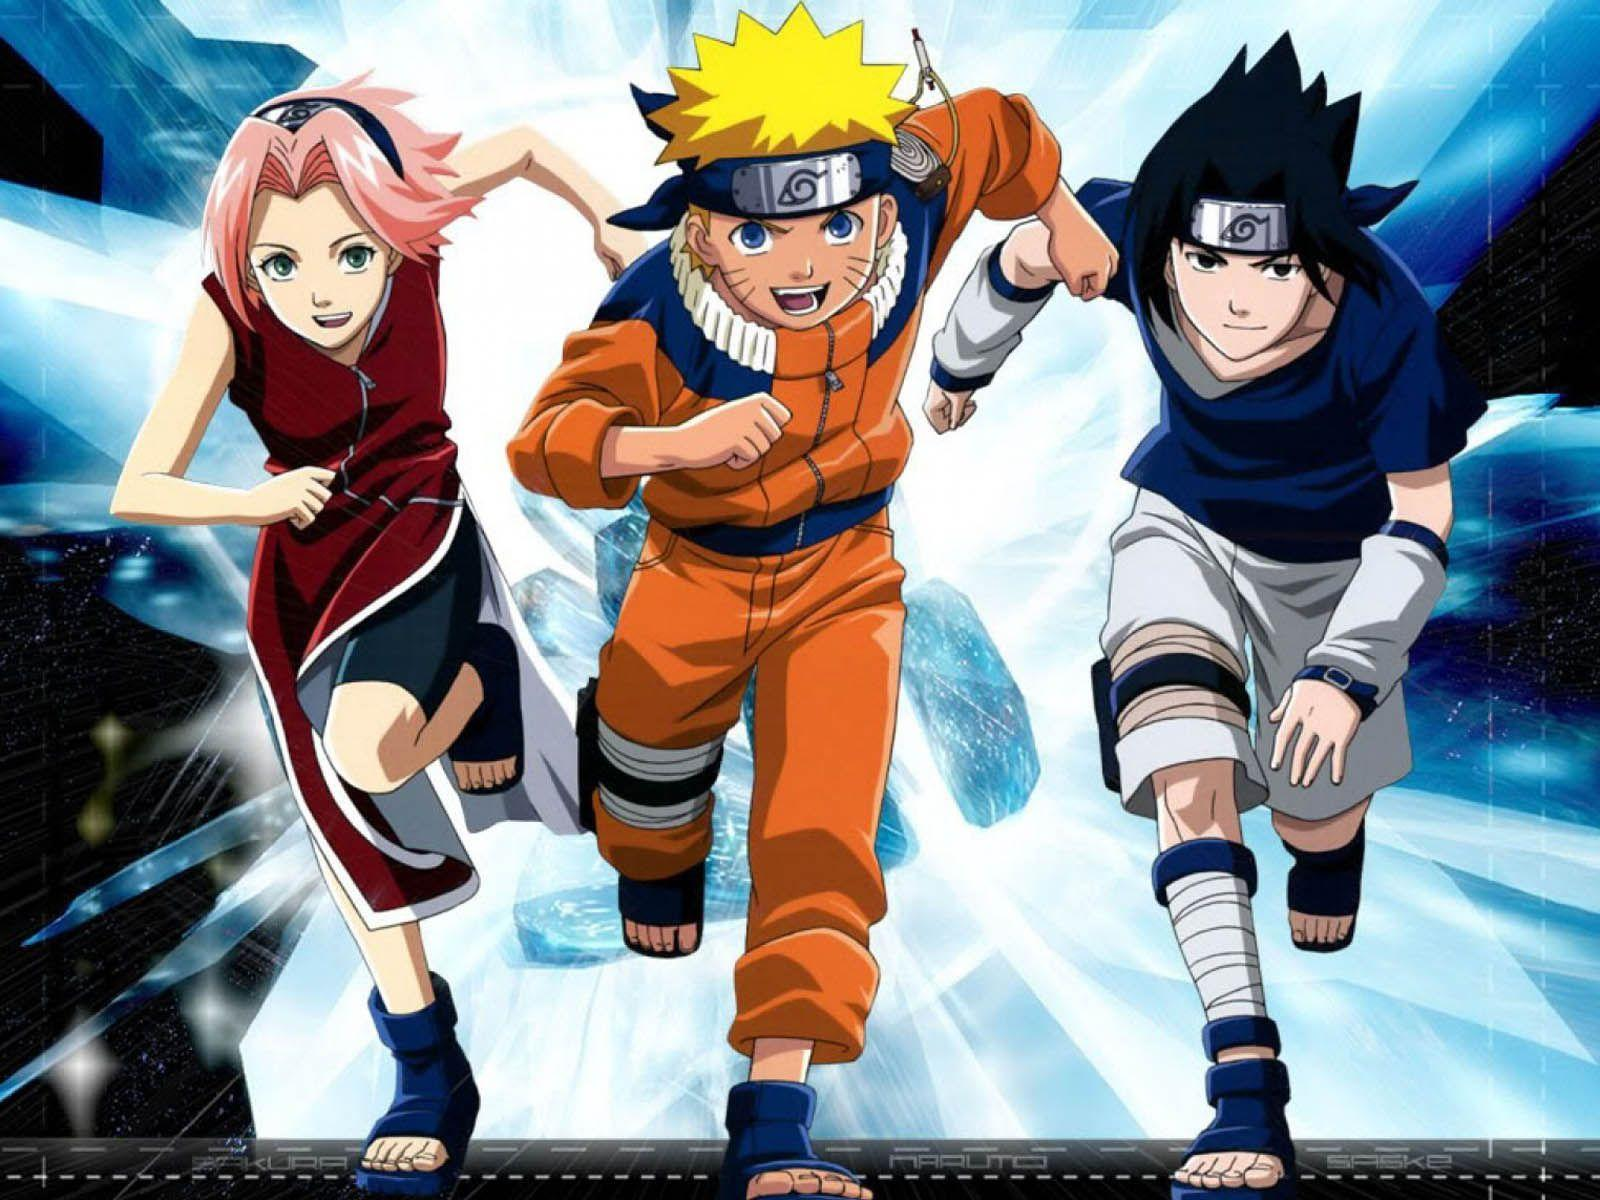 Unduh 800 Wallpaper Bergerak Anime Naruto